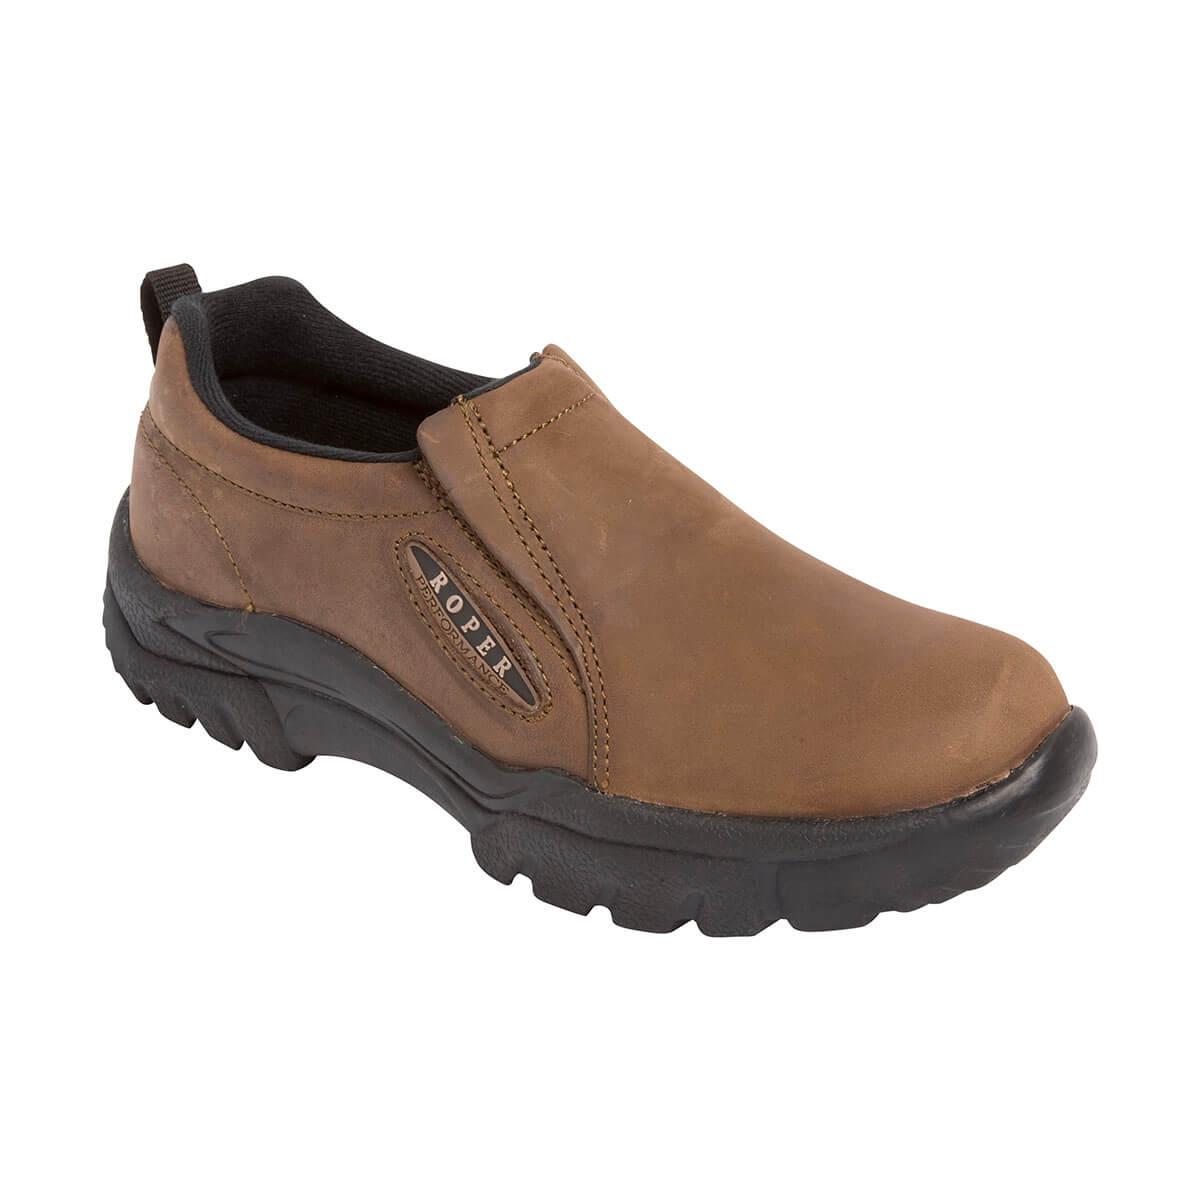 Men's Roper Western Shoes - Sport Slip On - Brown - 10